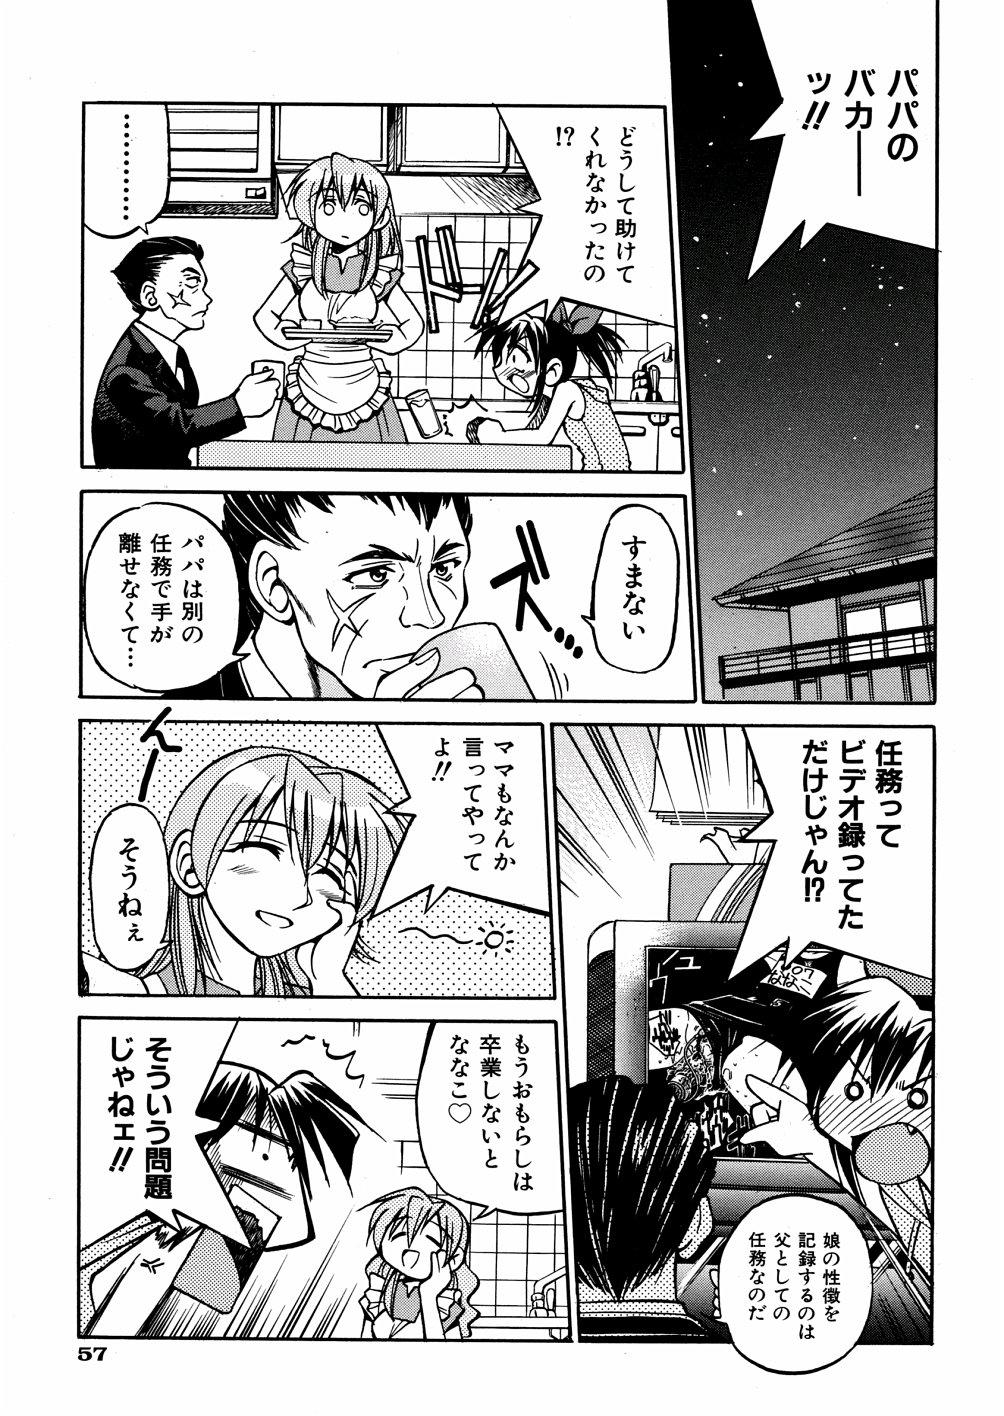 00 Nanako - Agent Nanako 59